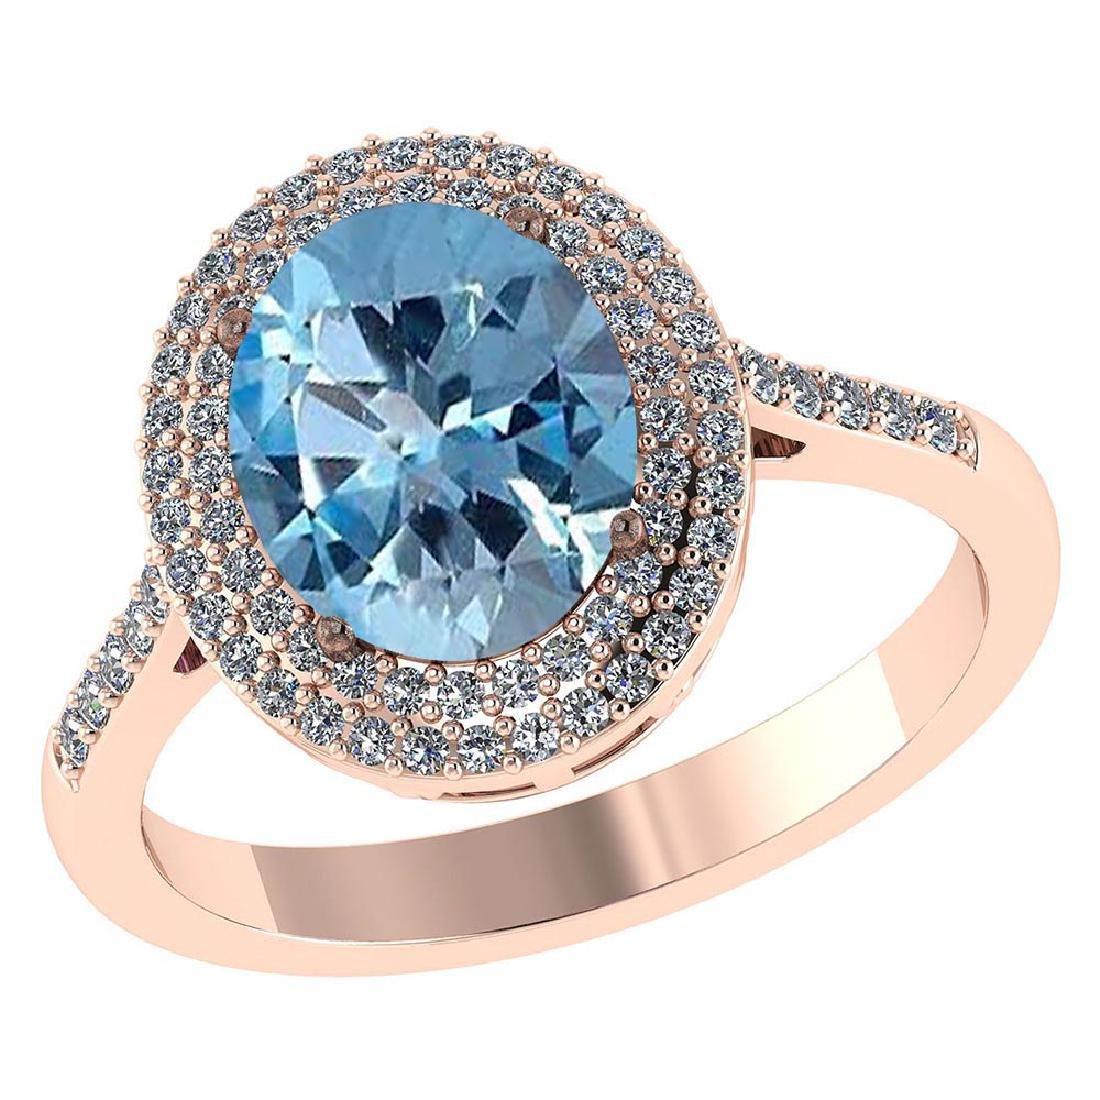 Certified 3.12 CTW Genuine Aquamarine And Diamond 14K R